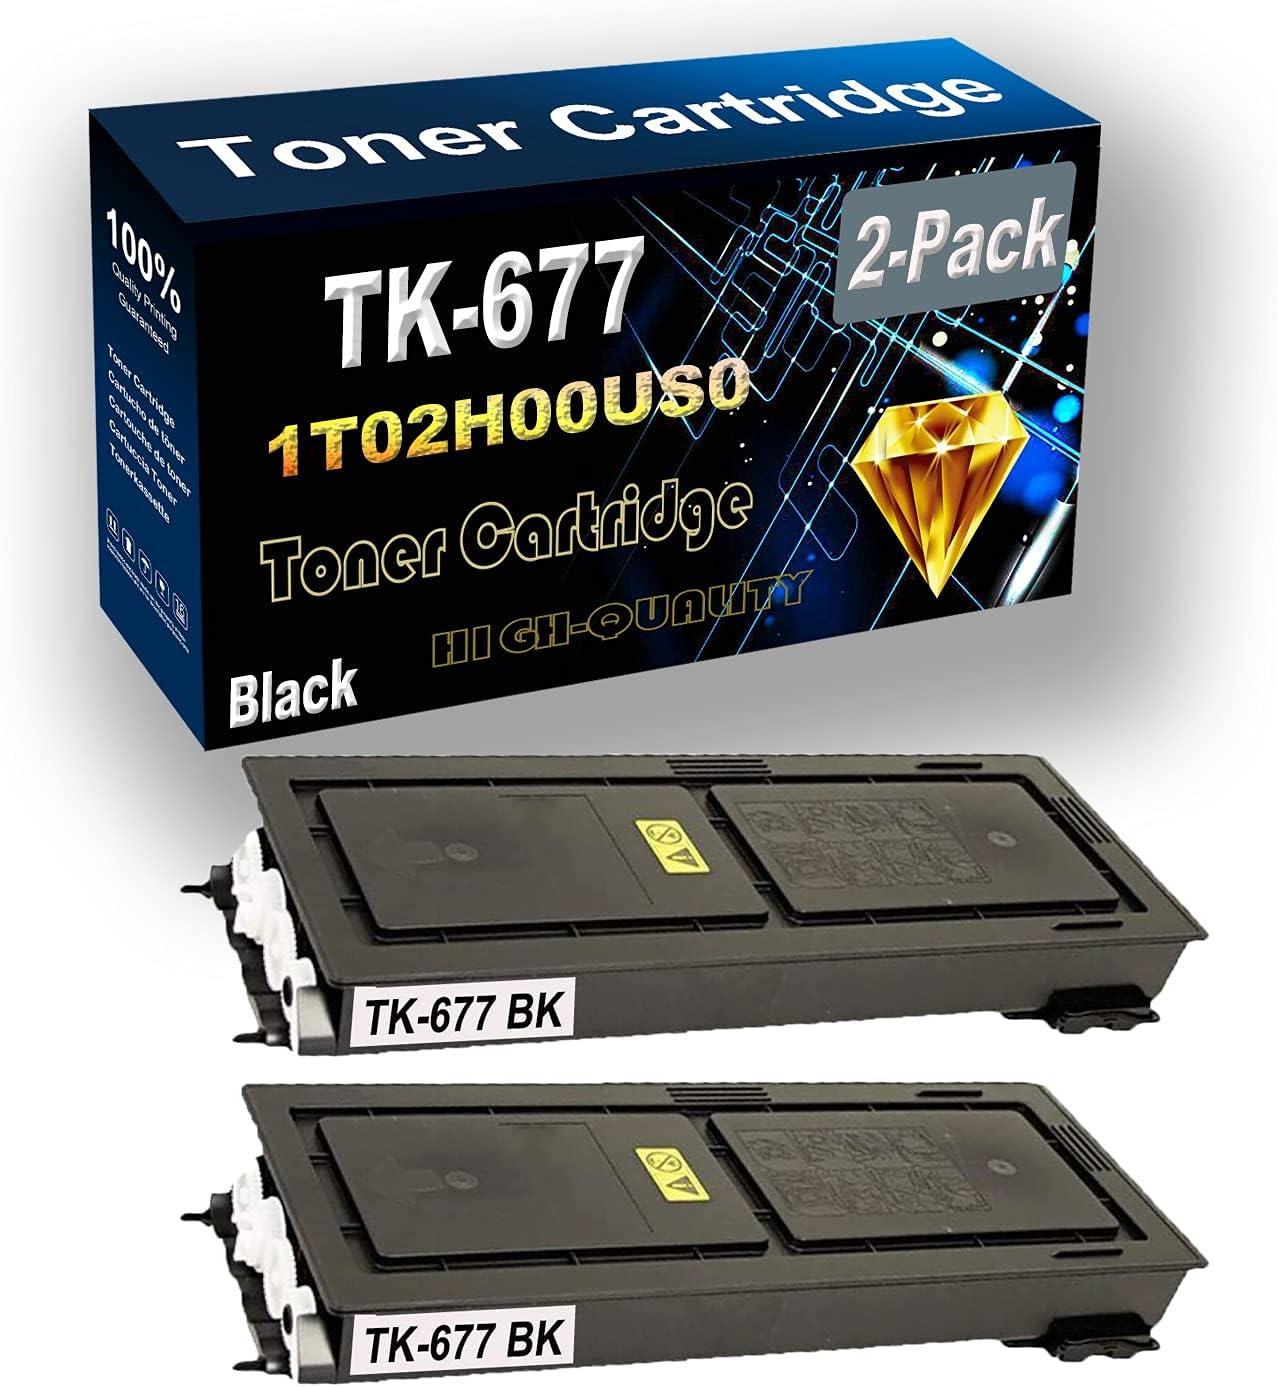 2-Pack (Black) Compatible High Yield TK677 TK-677   1T02H00US0 Laser Printer Toner Cartridge use for Kyocera KM-2540, KM-2560, KM-3040, KM-3060 and TASKalfa 300i Printer